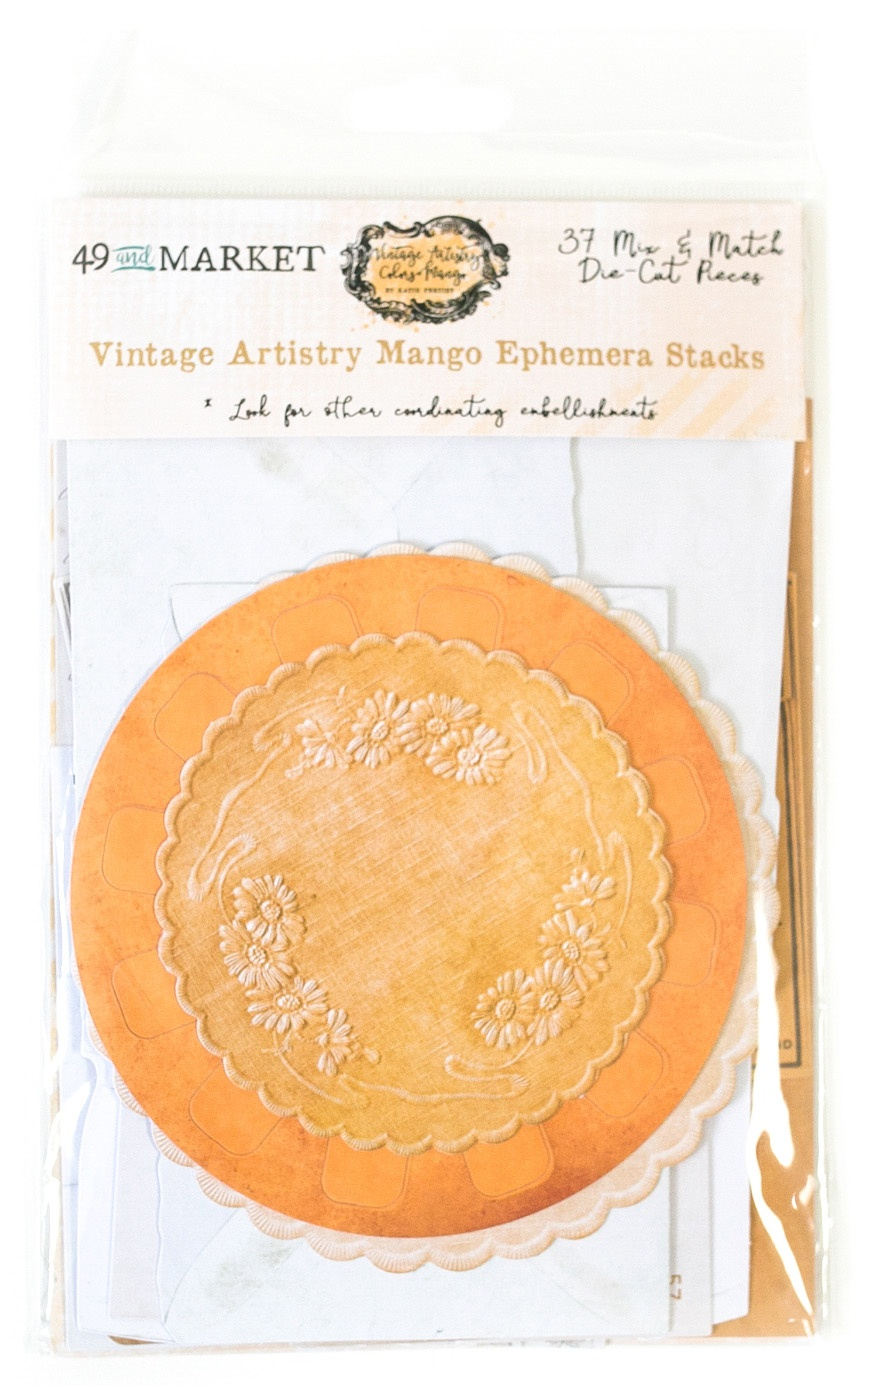 49 And Market - Vintage Artistry Mango Ephemera Stacks